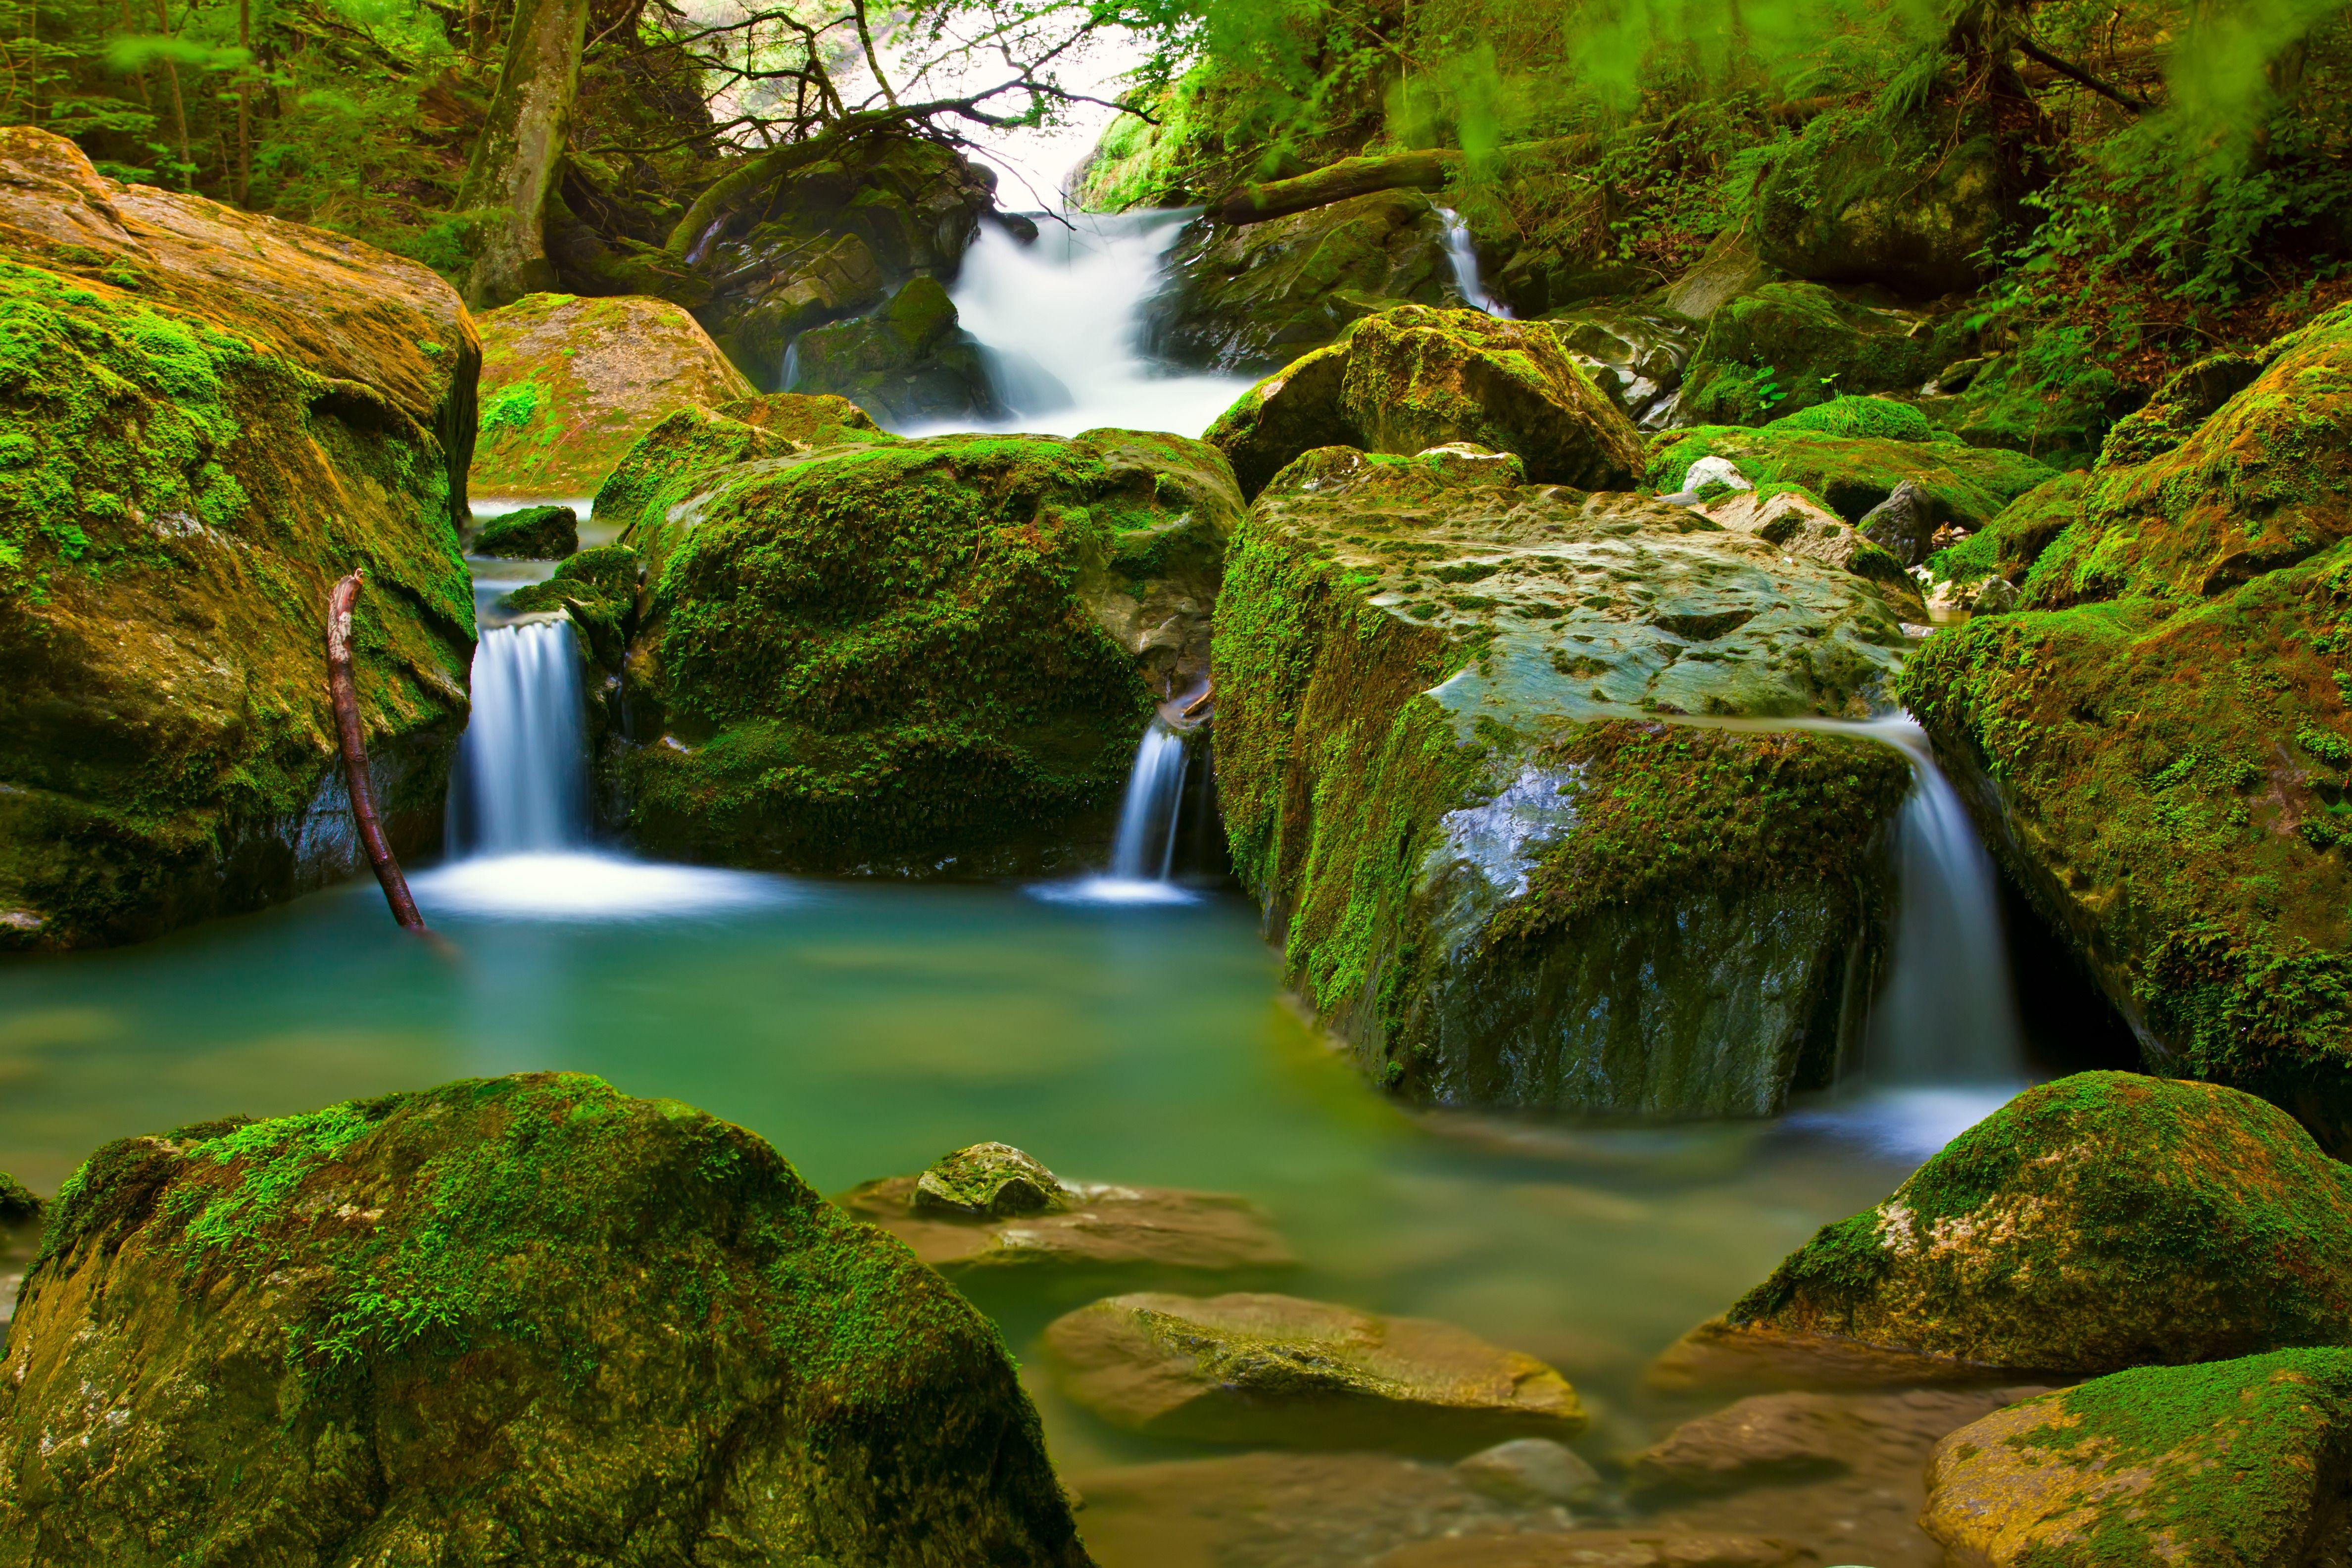 Paisagem cachoeira mozarth11 pinterest cachoeira for Waterfall green design centre